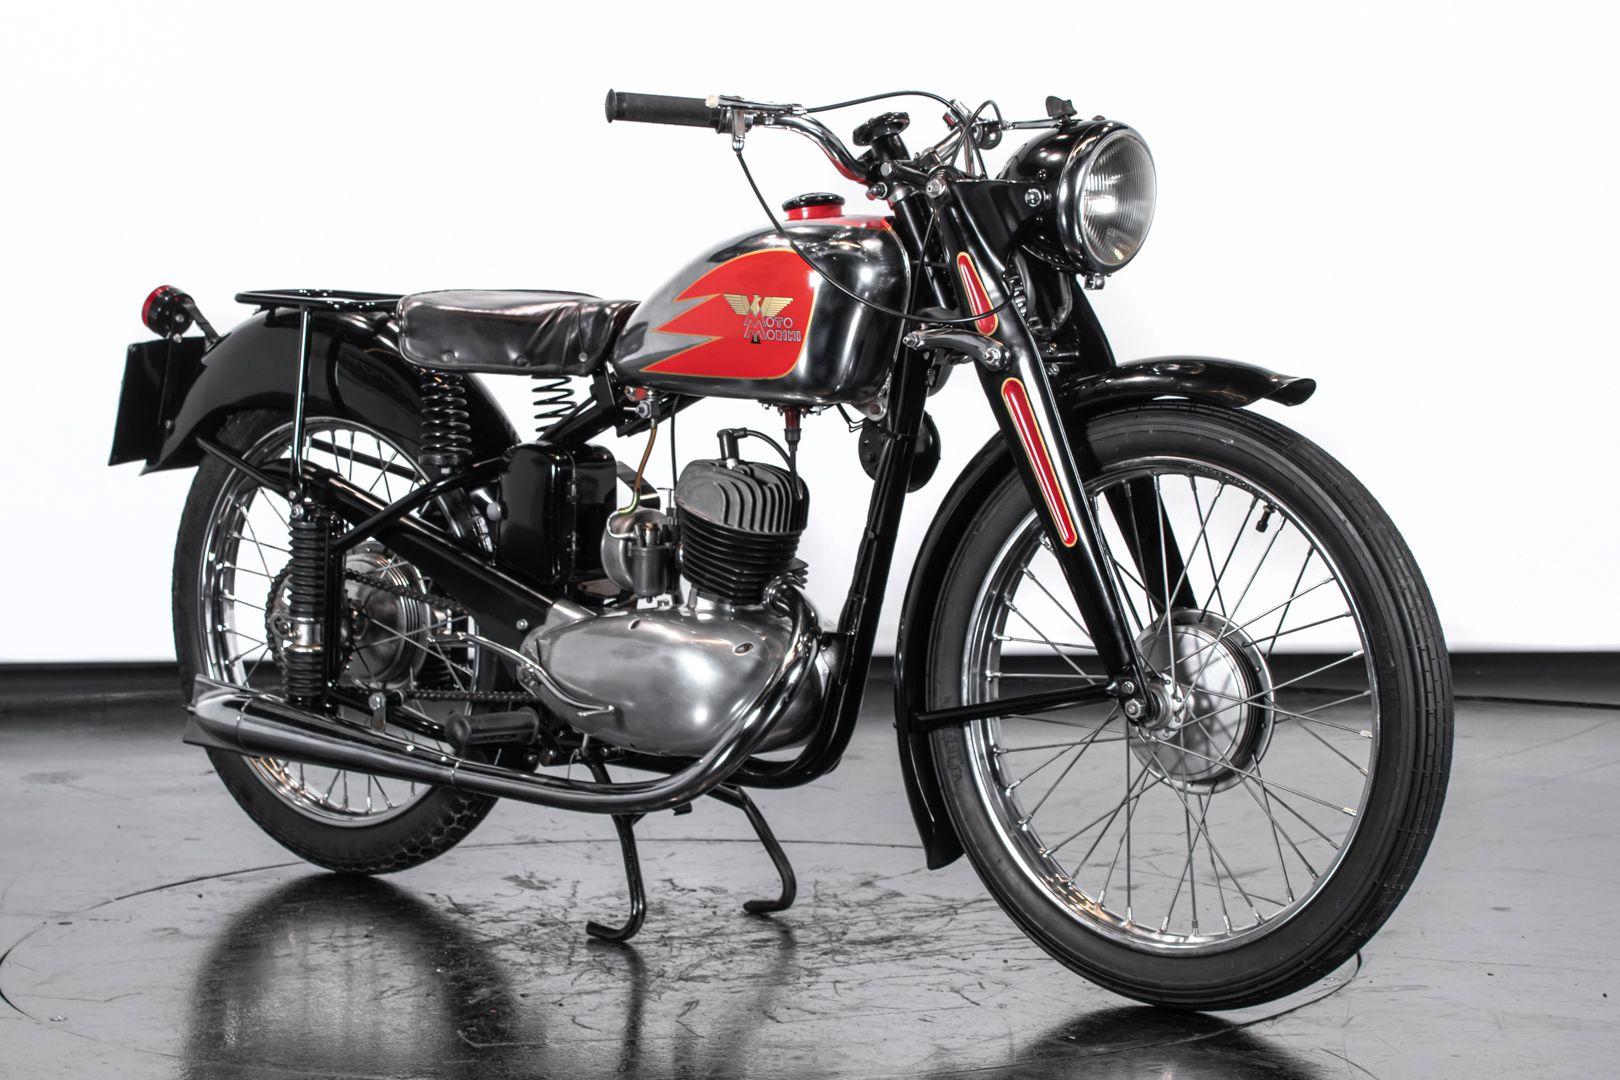 1952 Moto Morini Motore Lungo 2T 125 78766